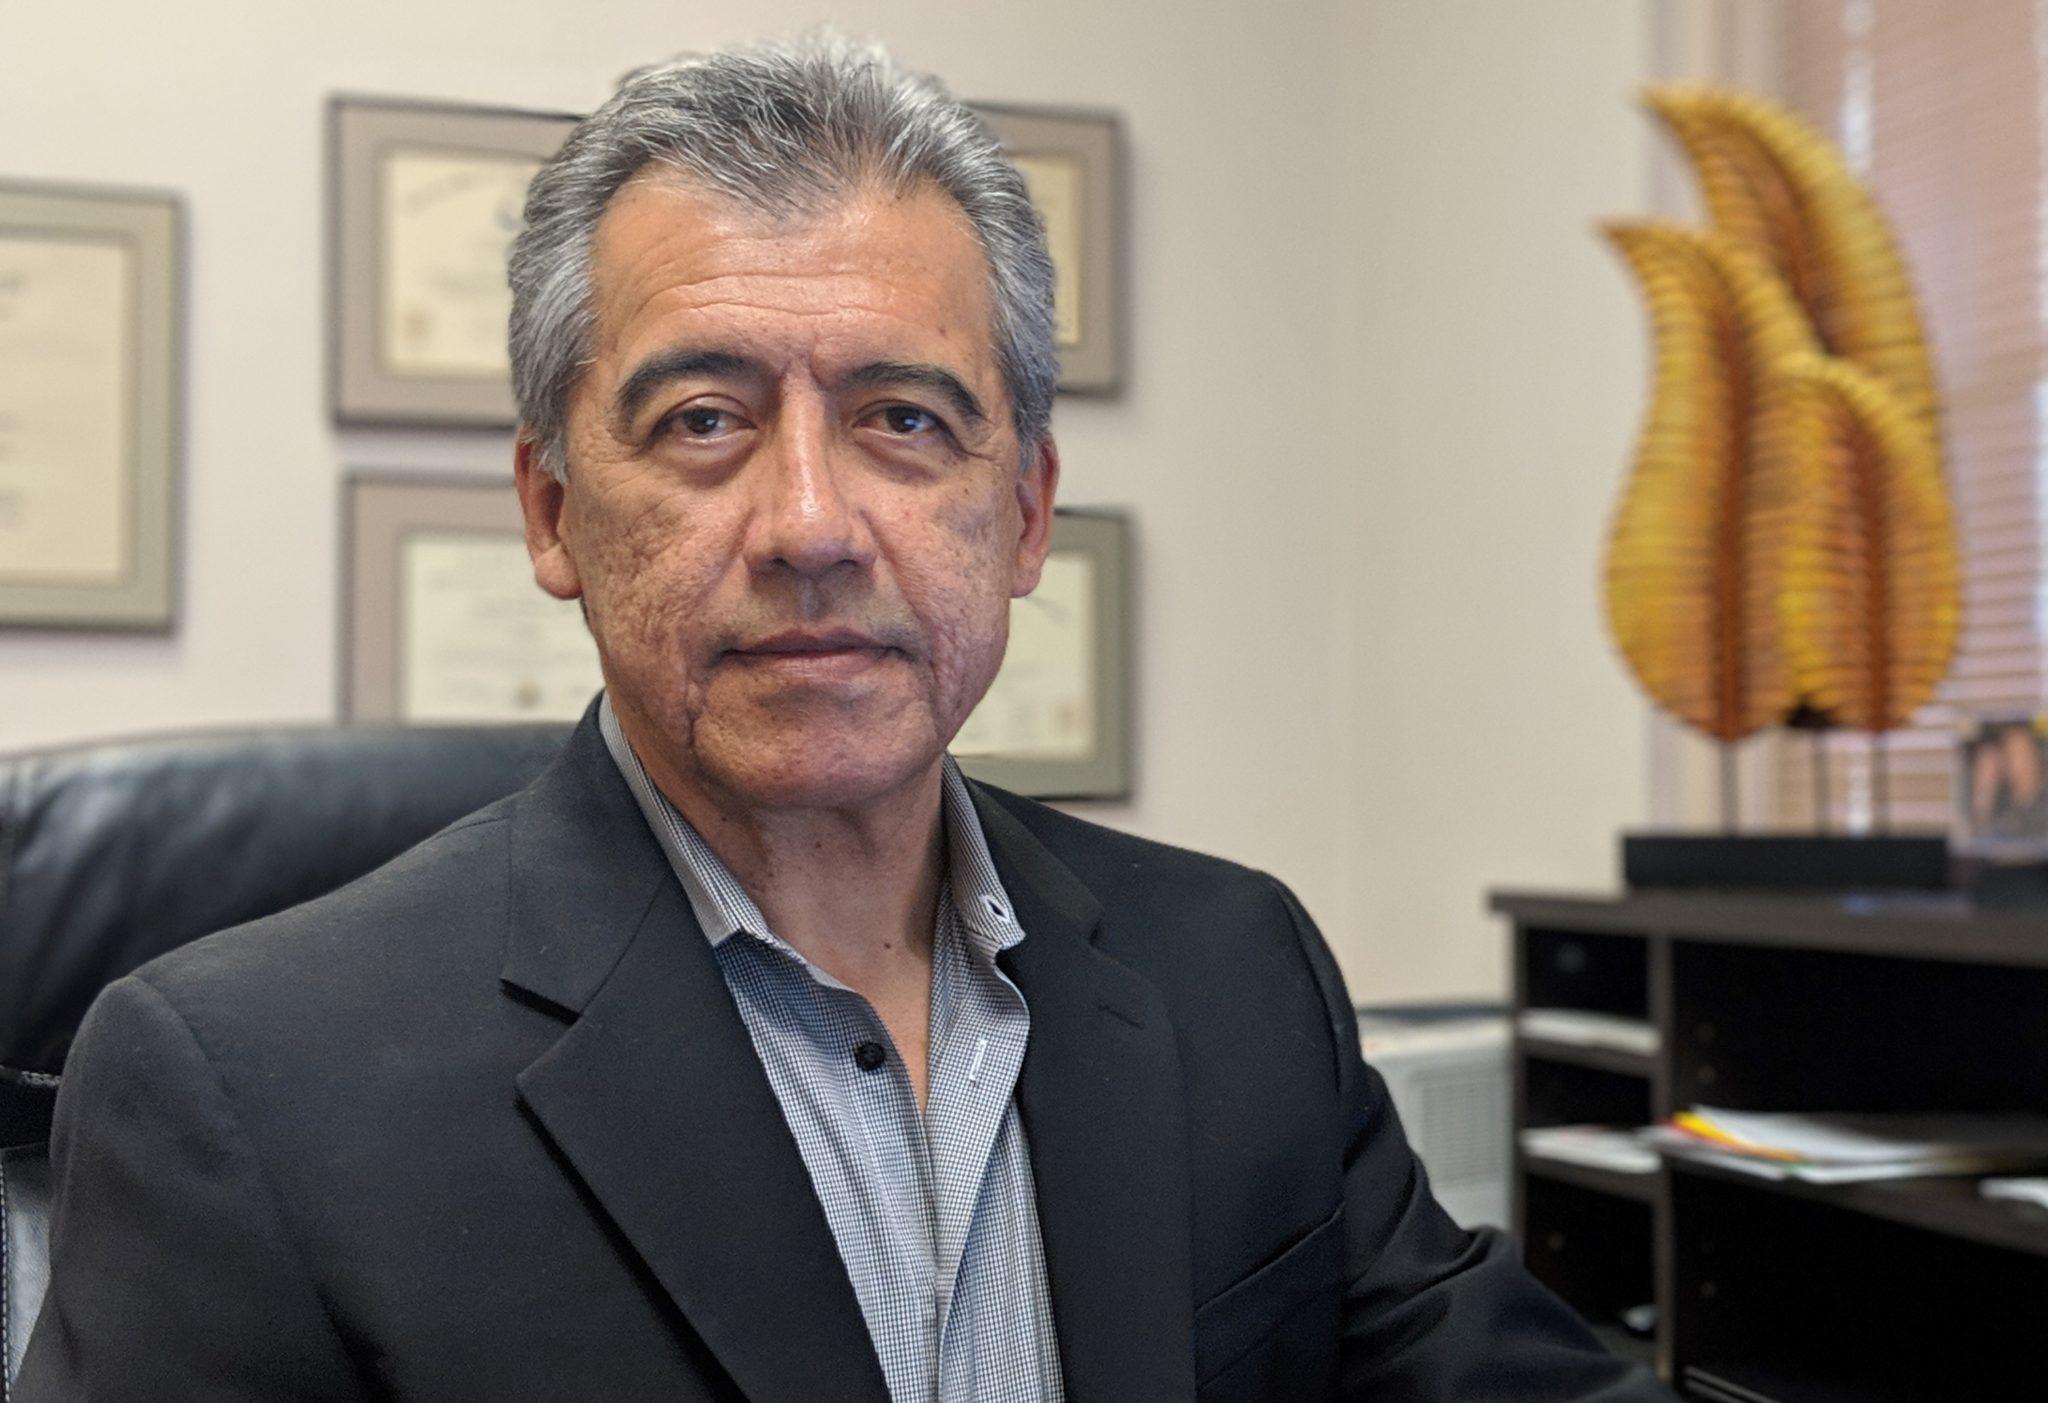 Dr Herrera Gyno next Trader Joe's